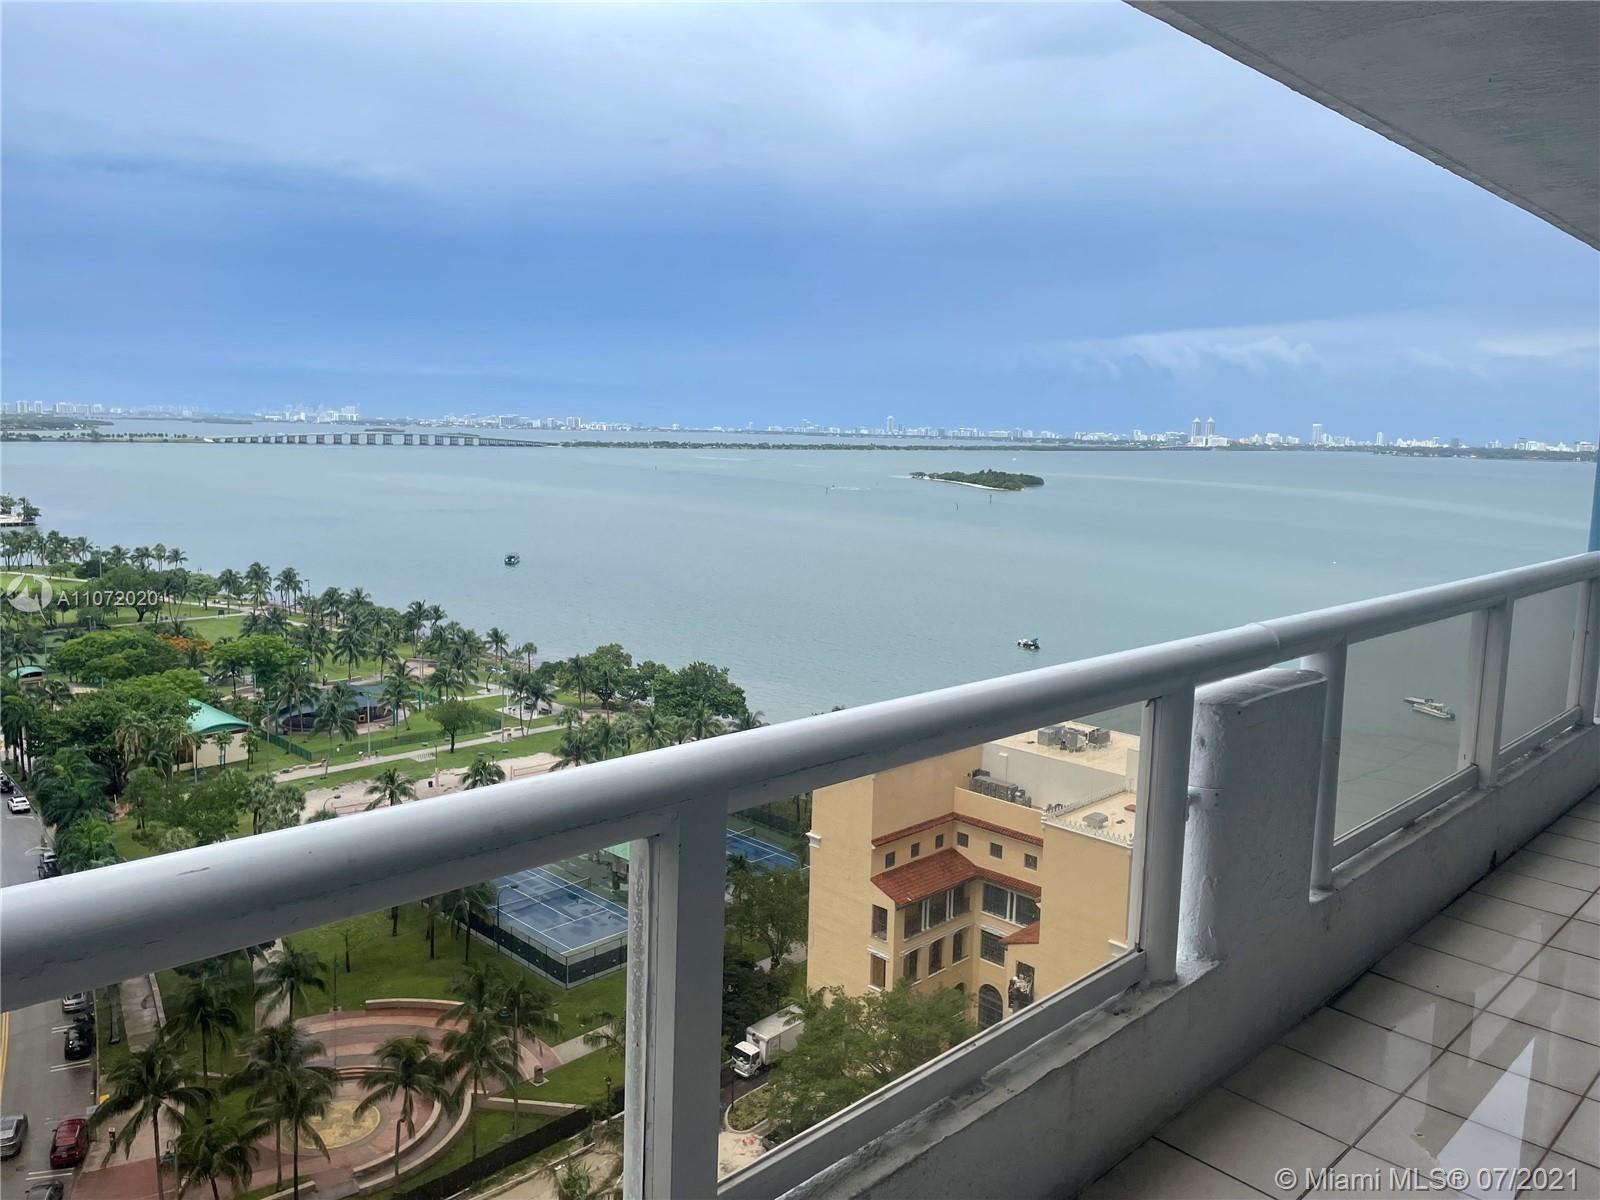 1717 N Bayshore Dr #A-2150, Miami, FL 33132 - #: A11072020